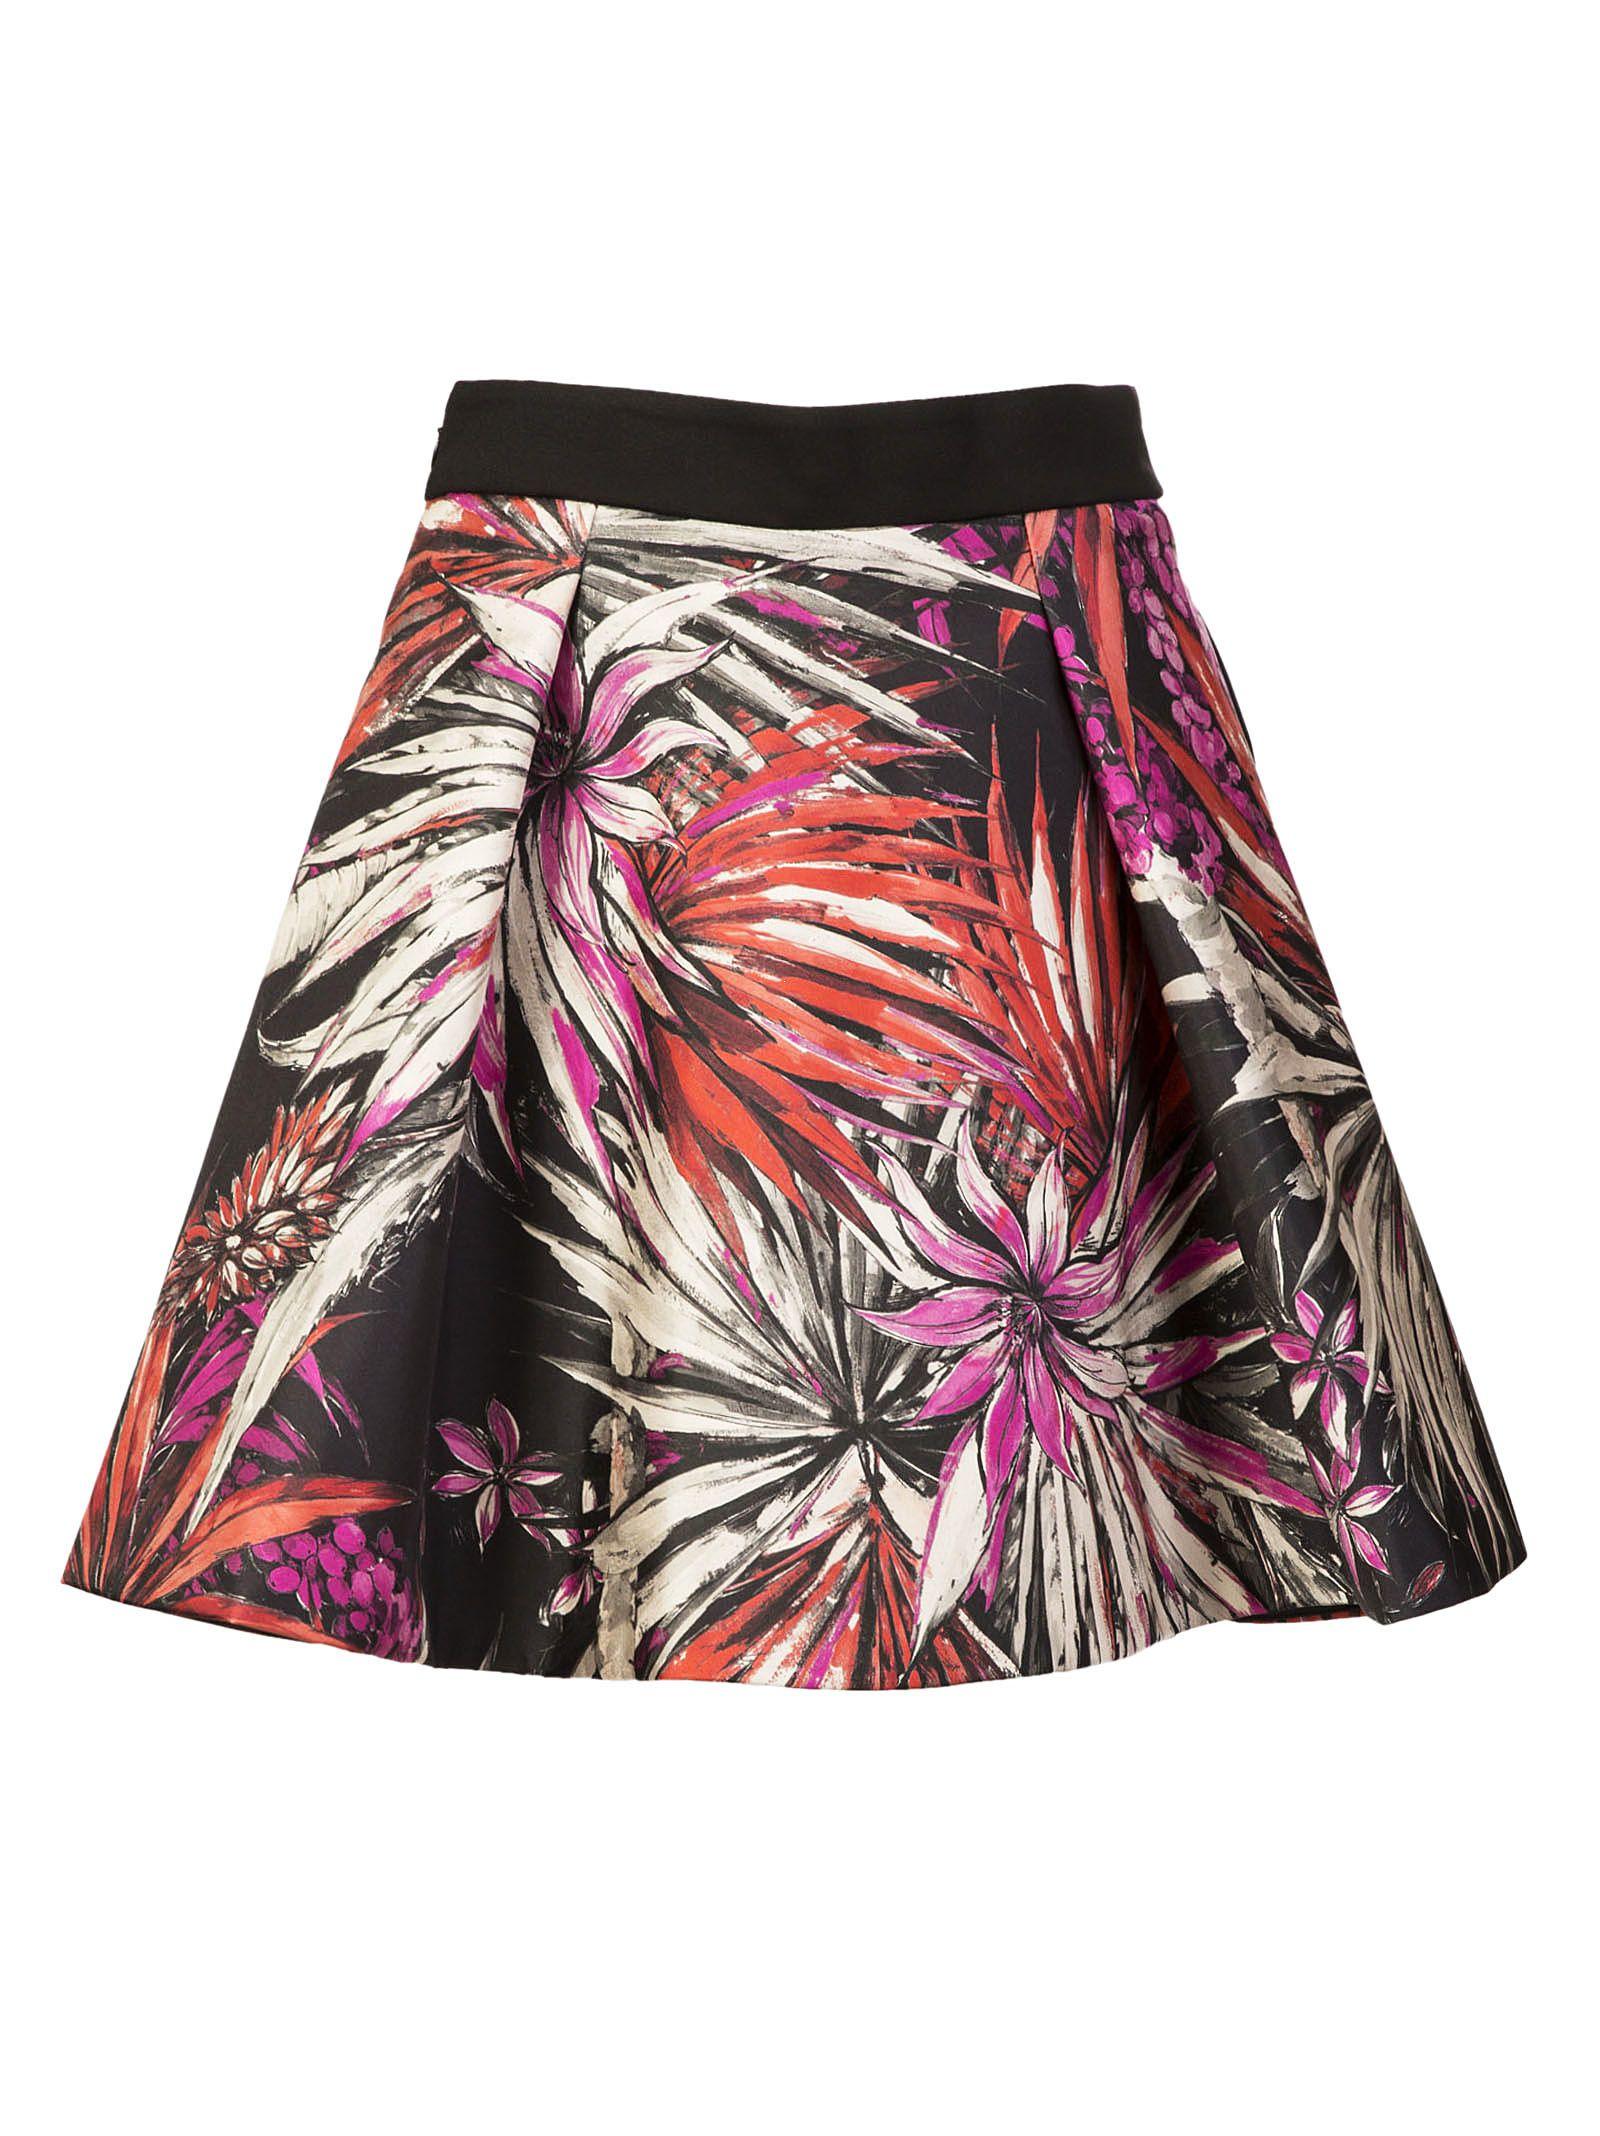 Fausto Puglisi Fantasia Skirt